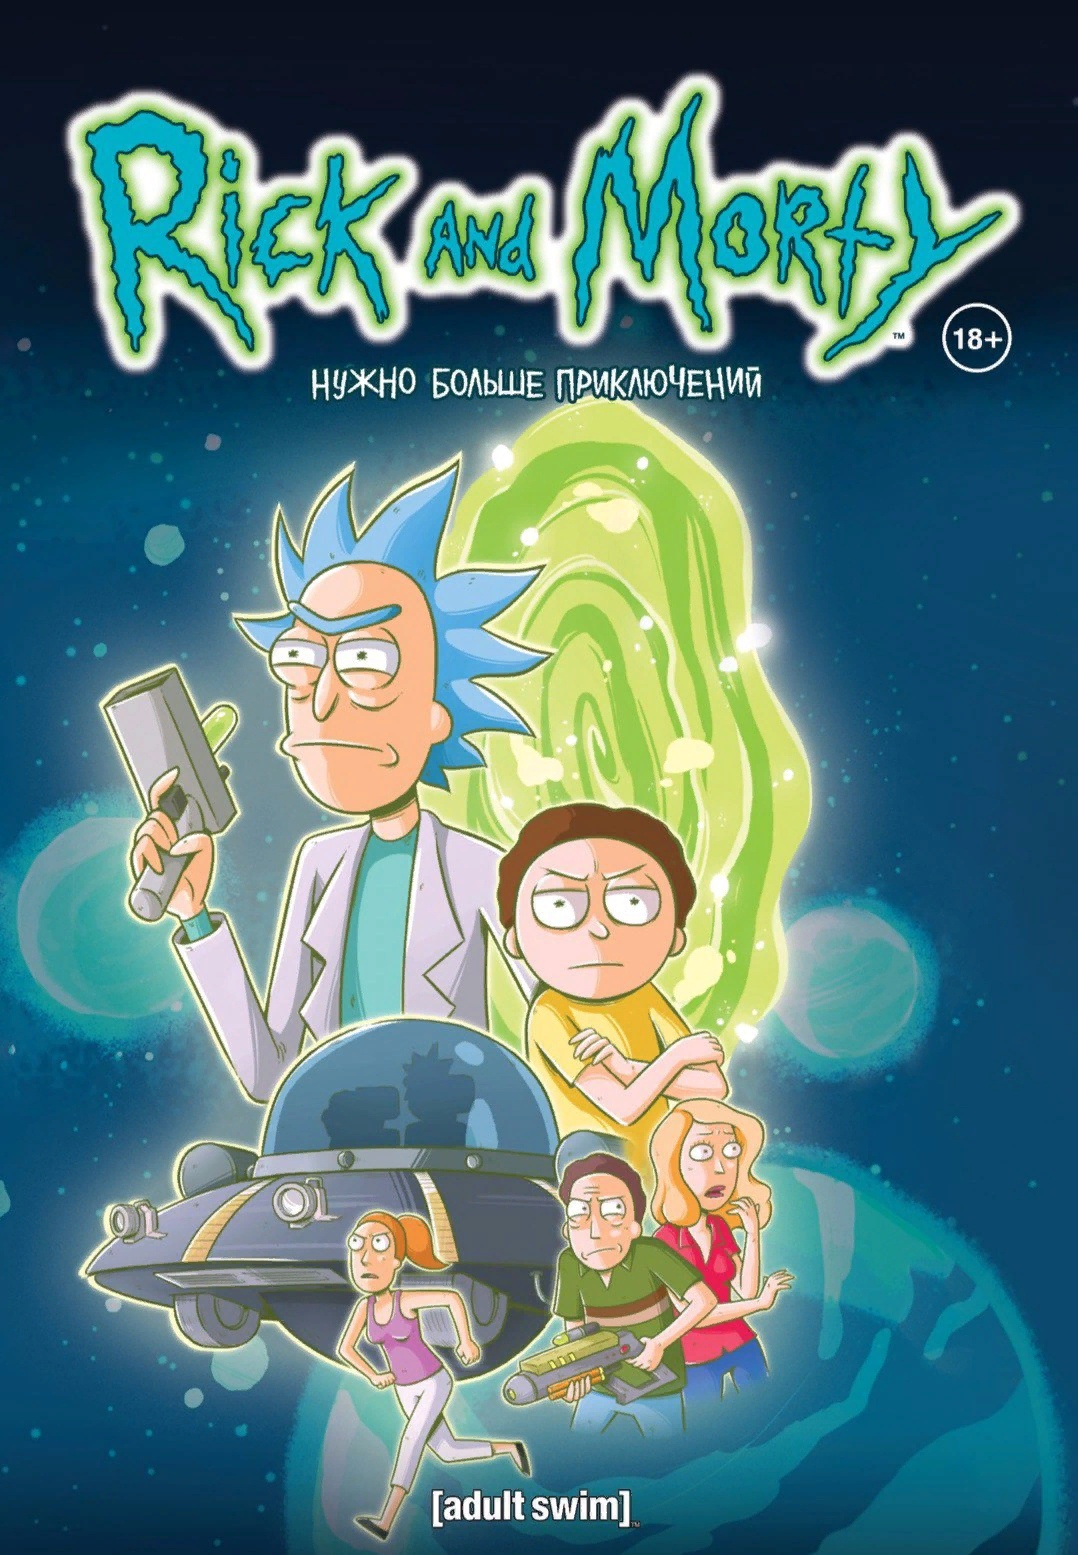 Rick and Morty книга 2 нужно больше приключений marvelmuvie